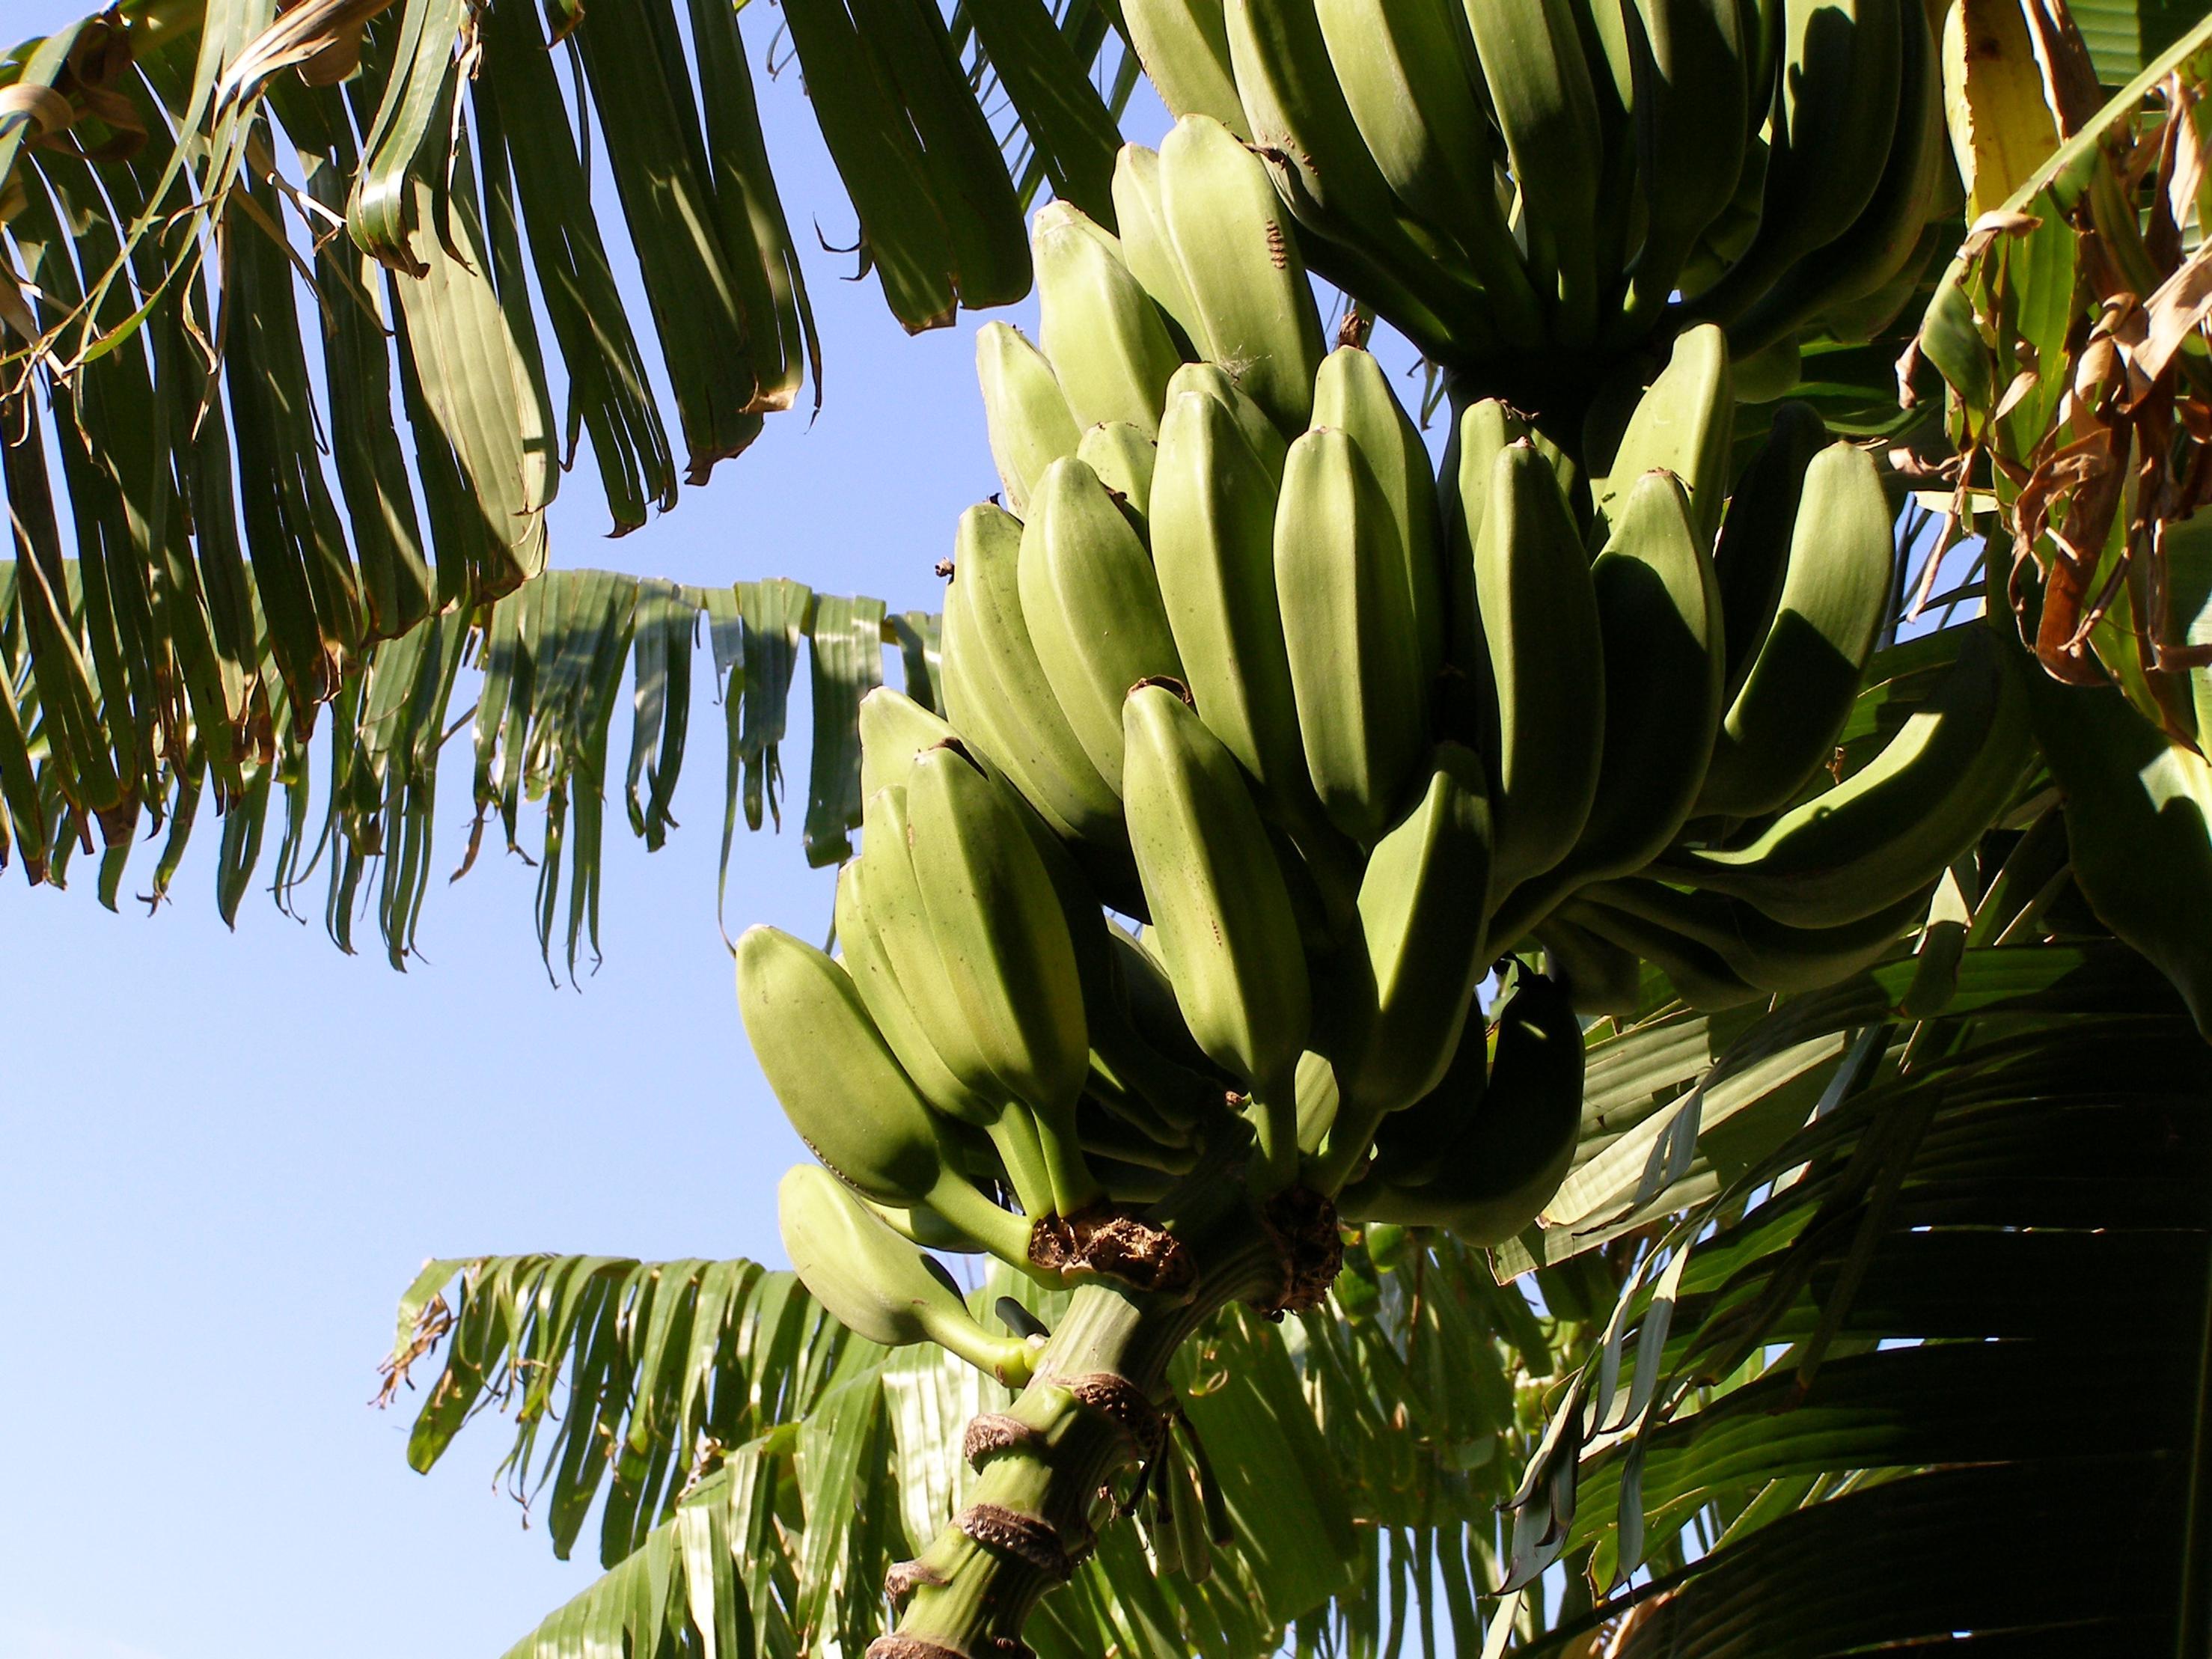 Imagen Gratis Rbol Banana Naturaleza Flora Hoja Planta  # Muebles Hoja De Banano